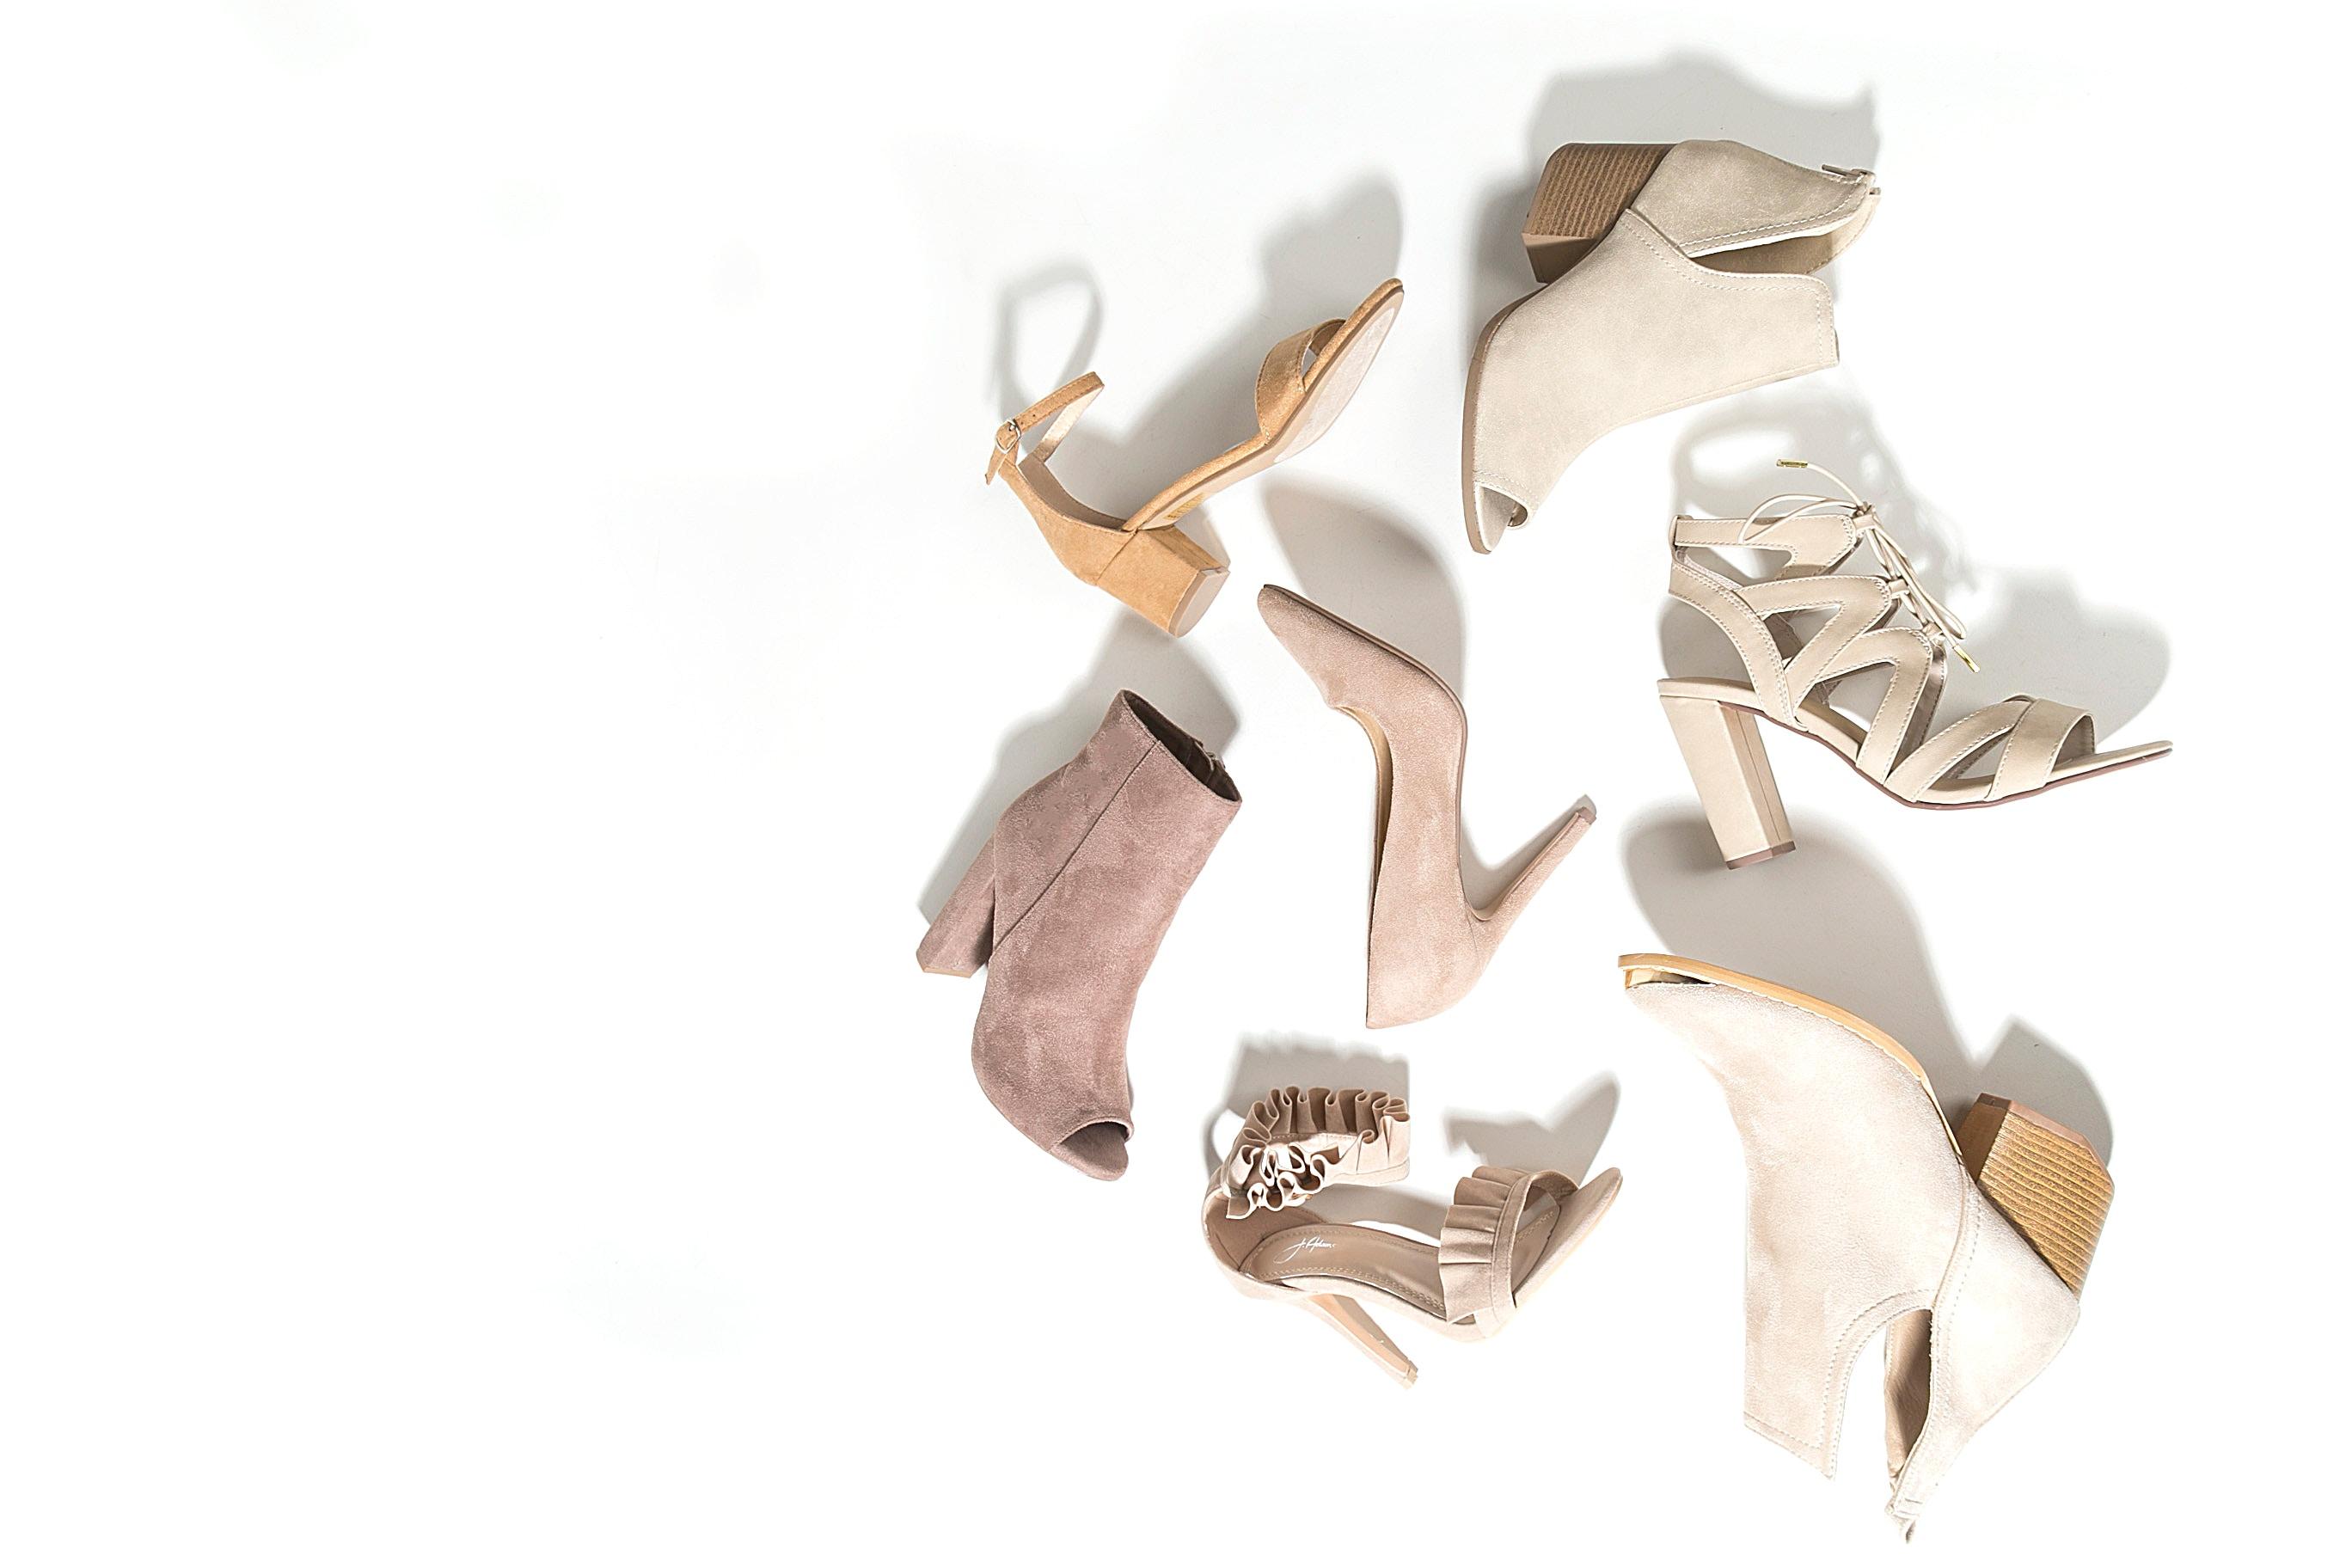 Southeast Asia's Homegrown Footwear Brands